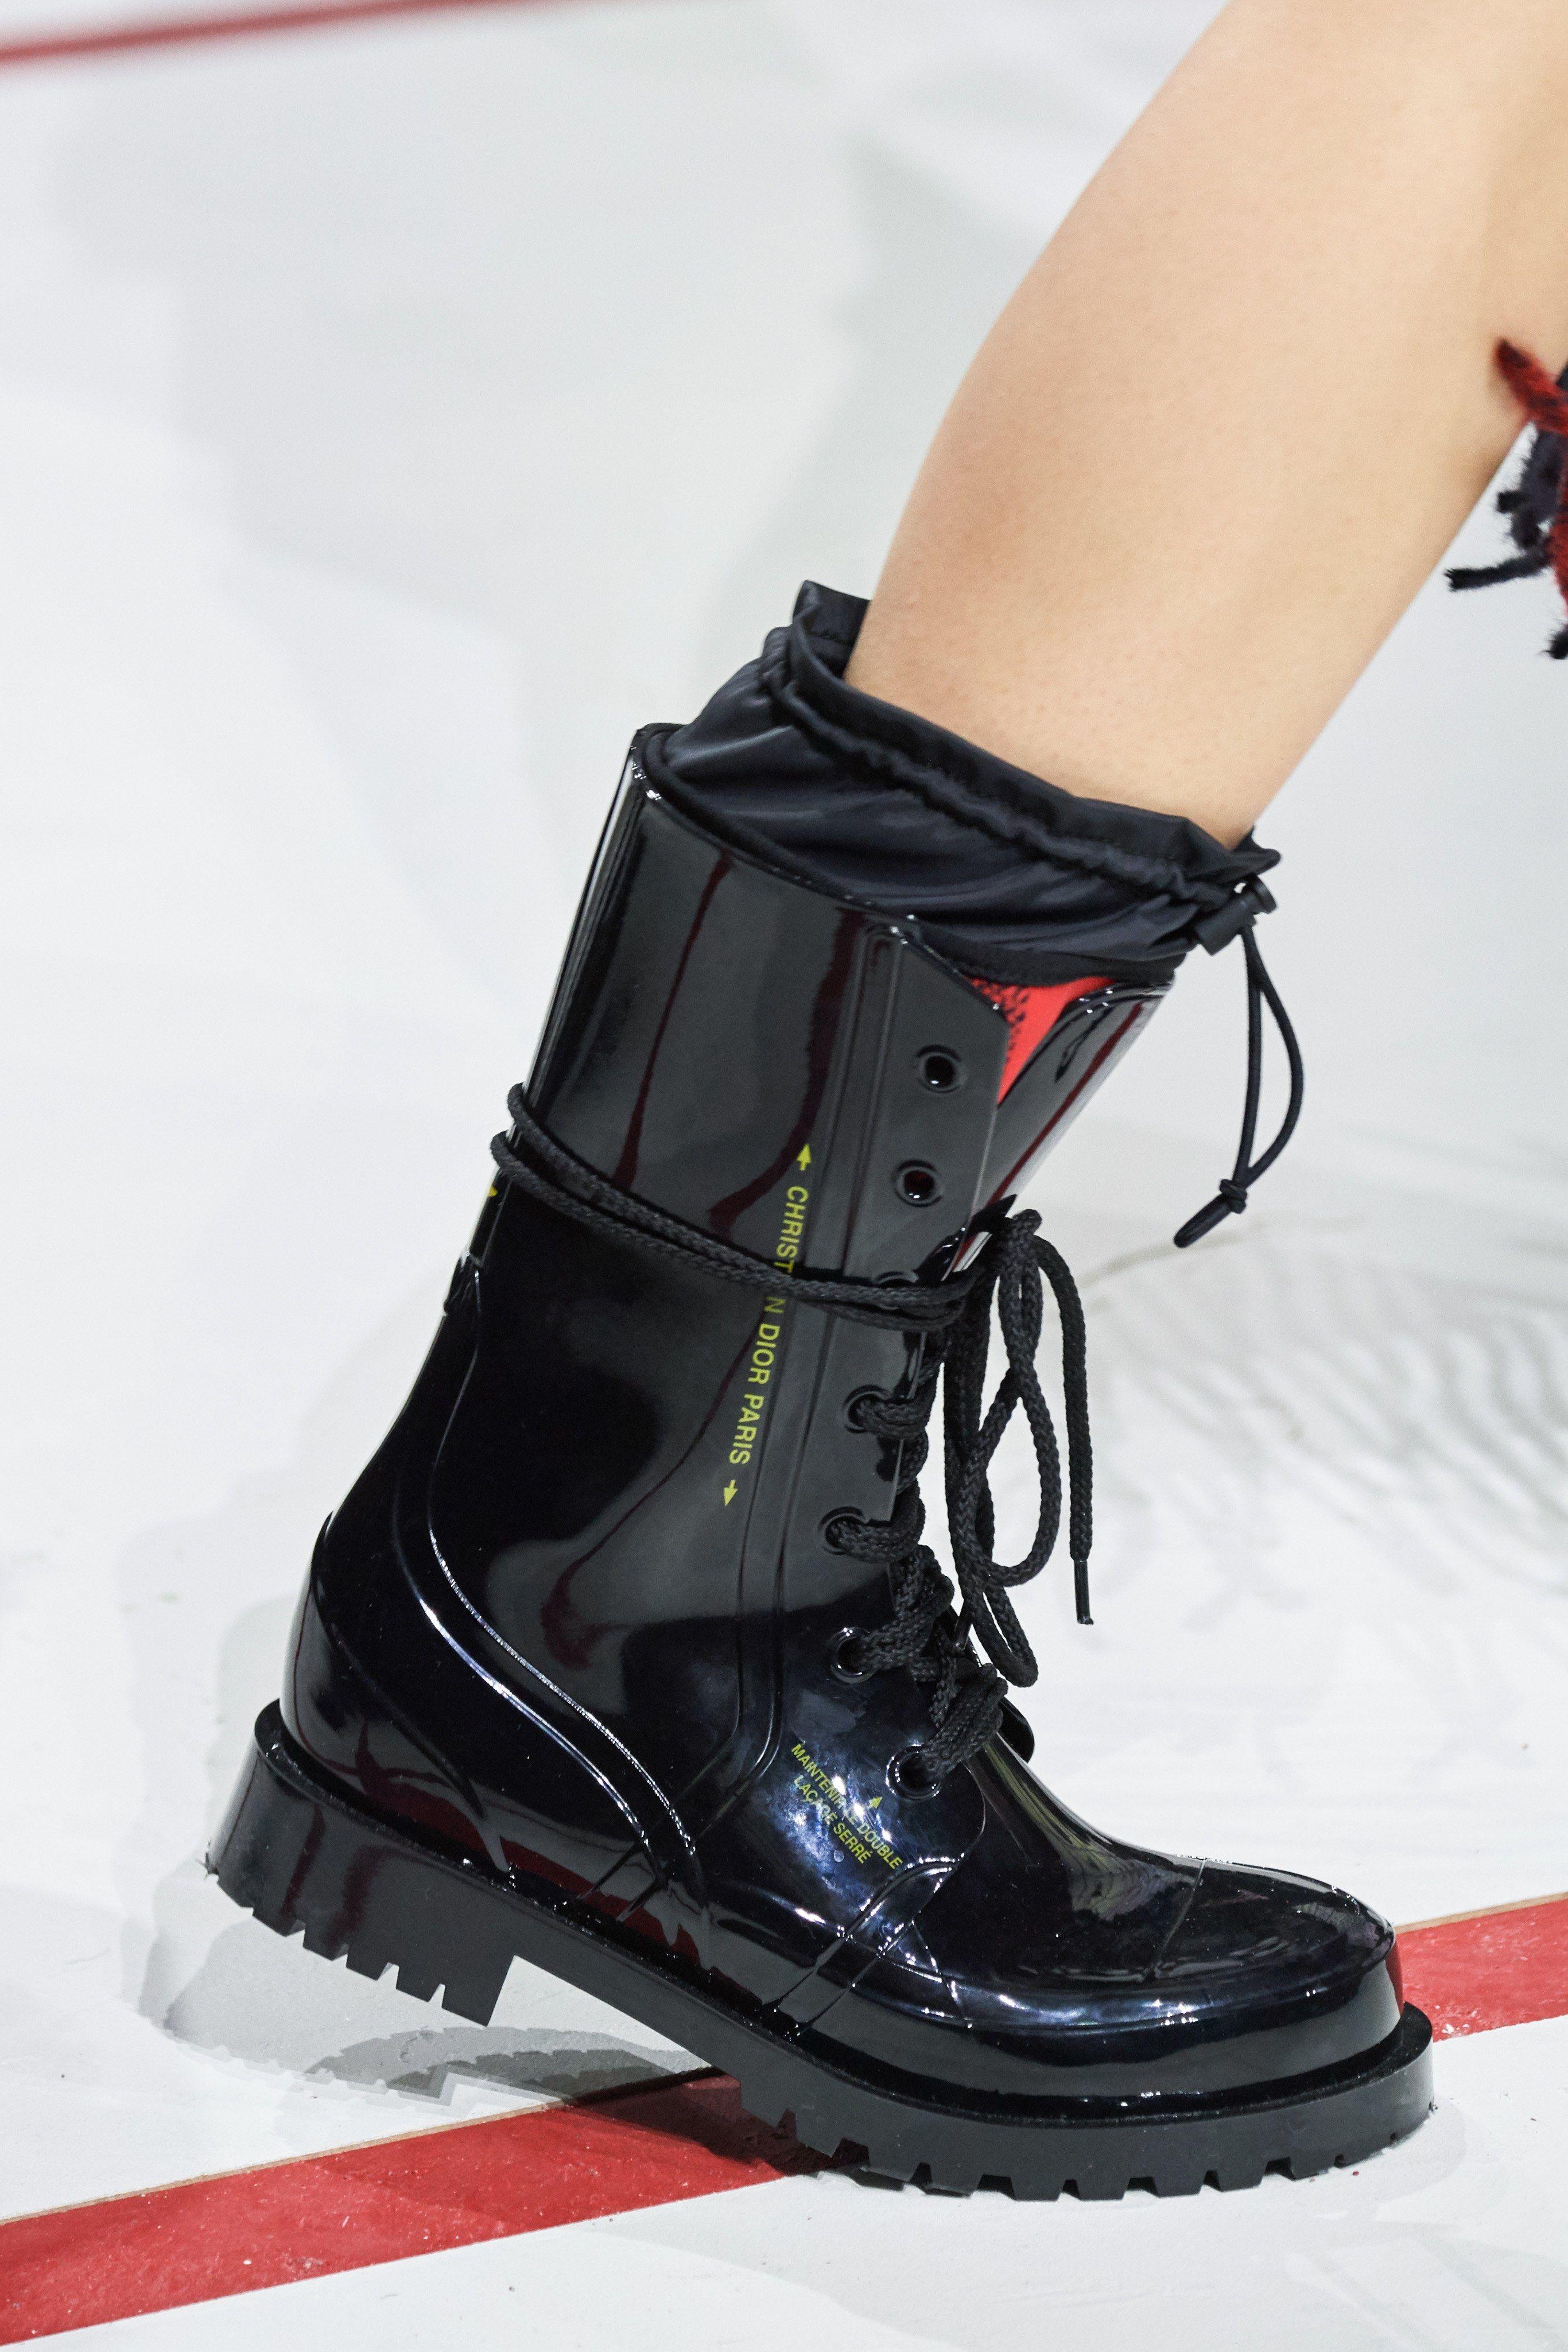 Christian Dior Fall 2019 Ready-to-Wear